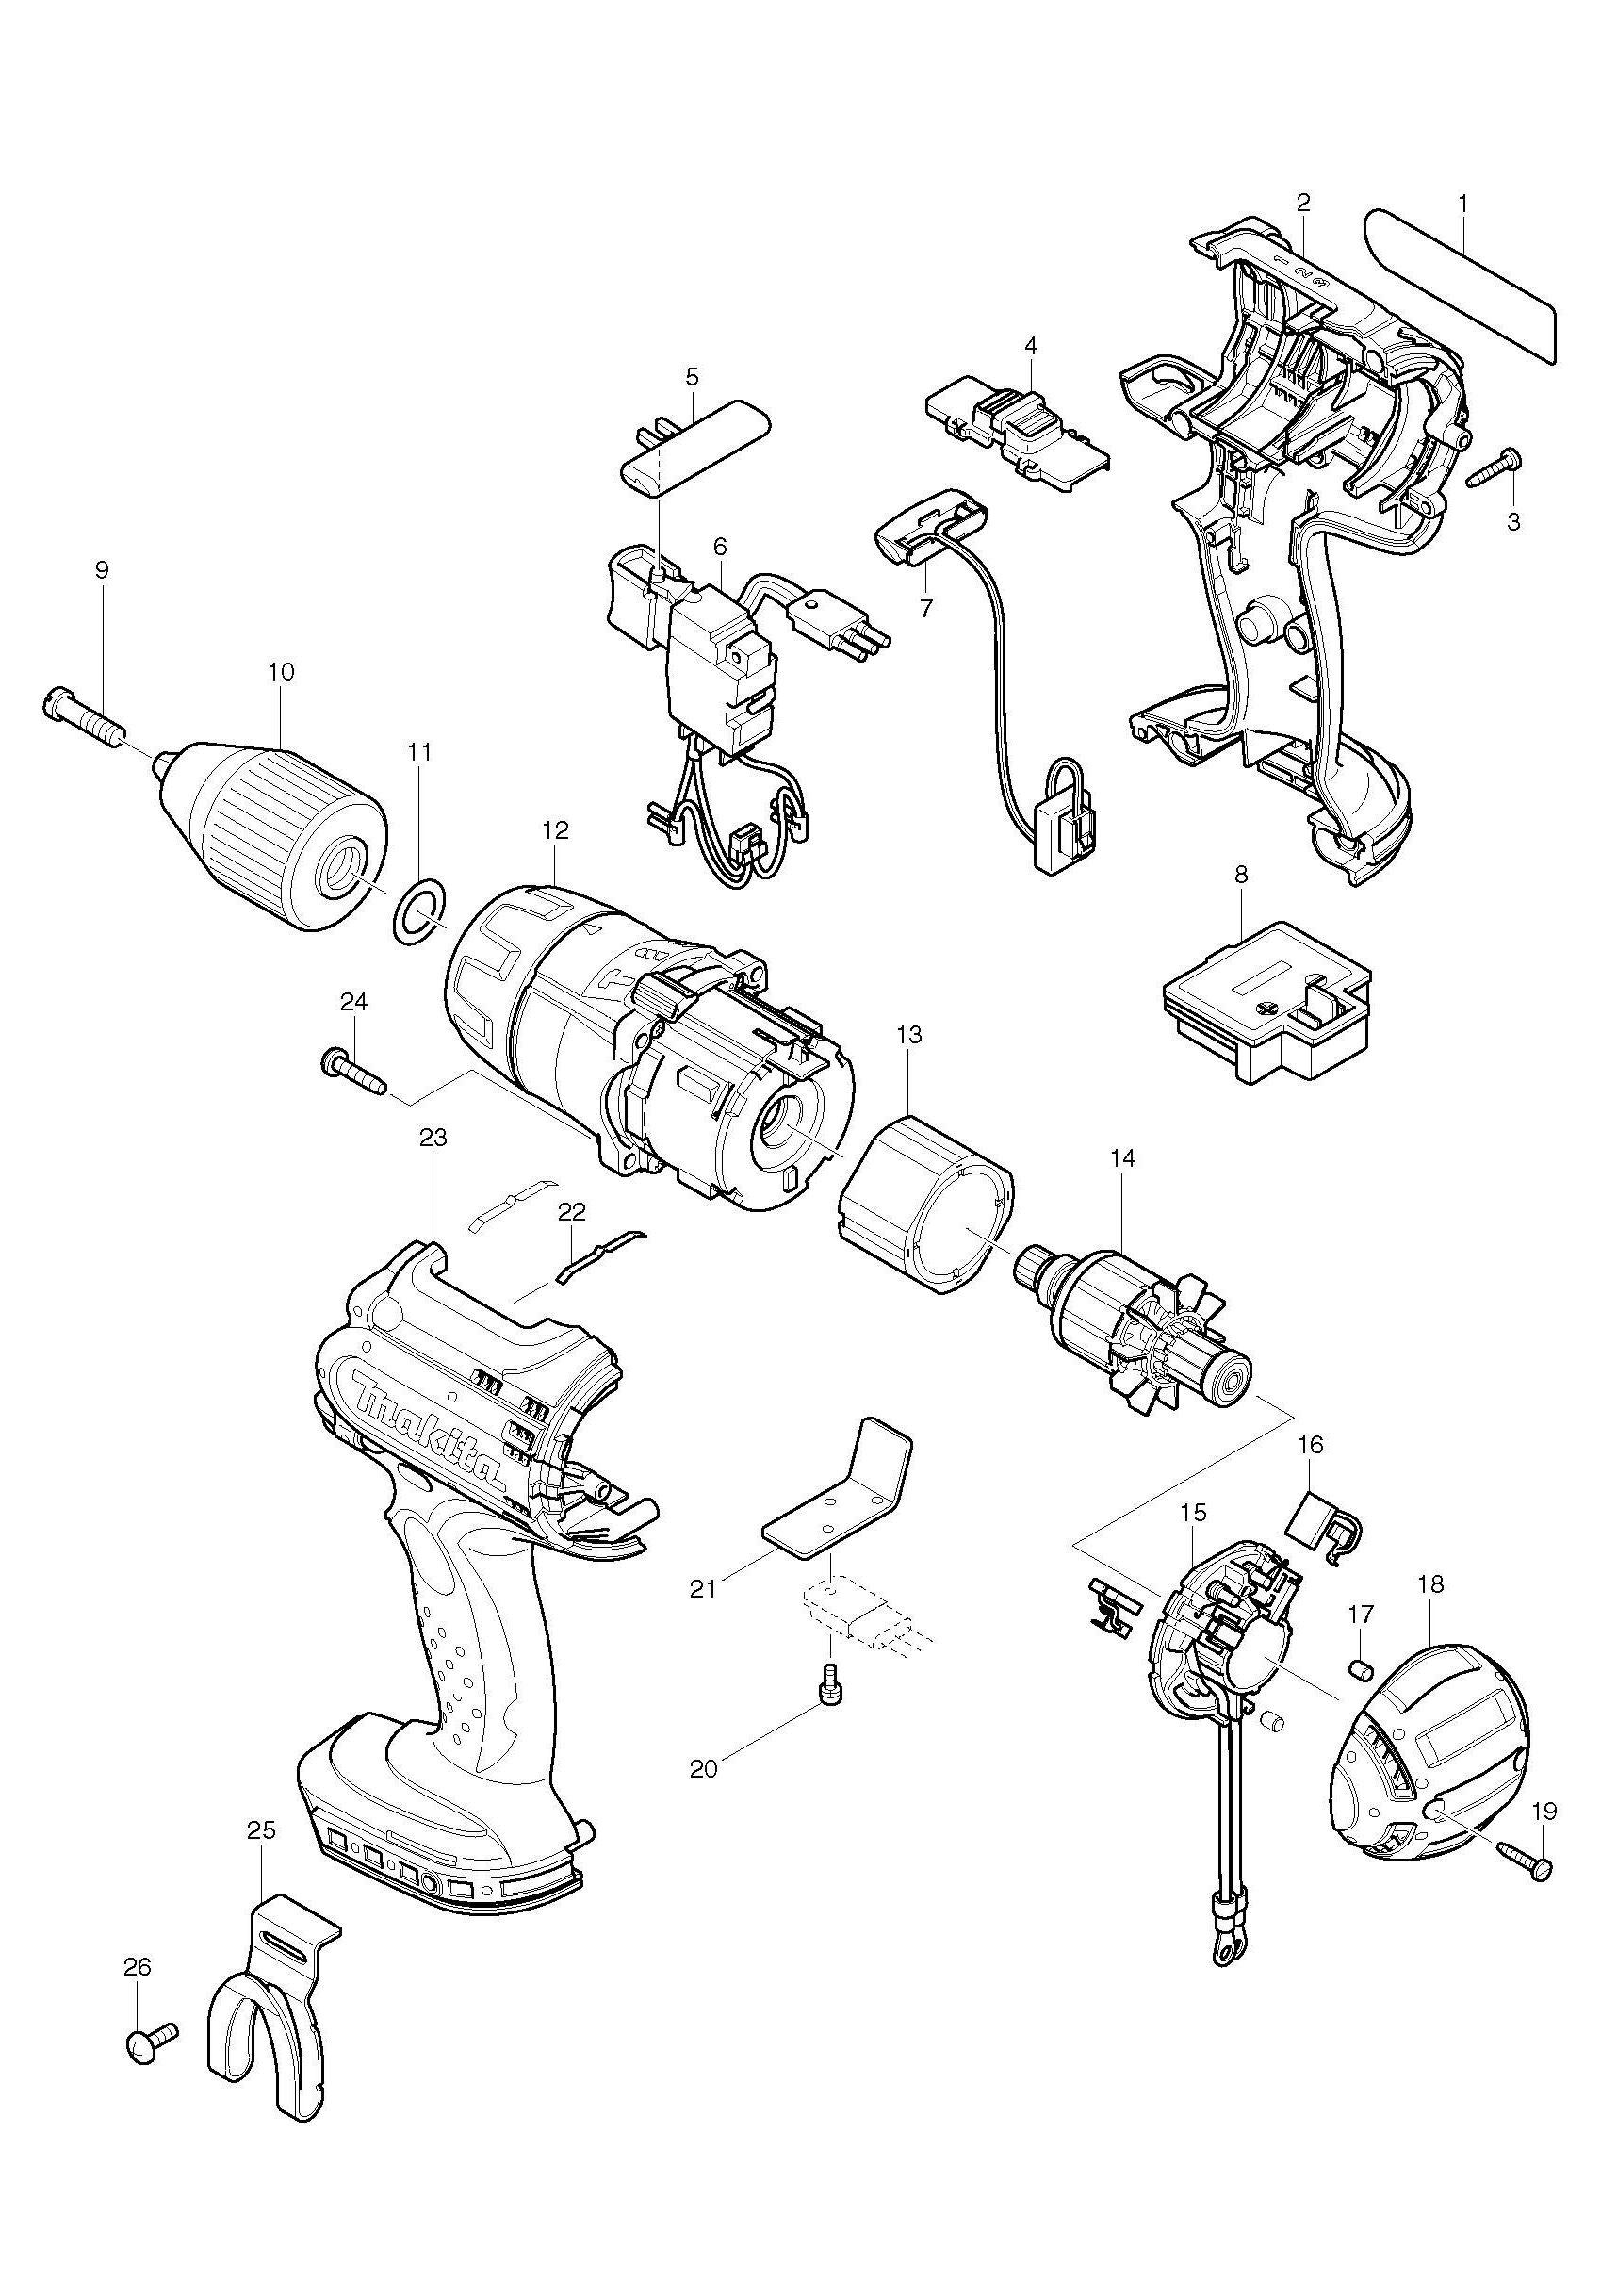 Makita Bhp451 Cordless 3 Speed Combi Drill 18v Spare Parts